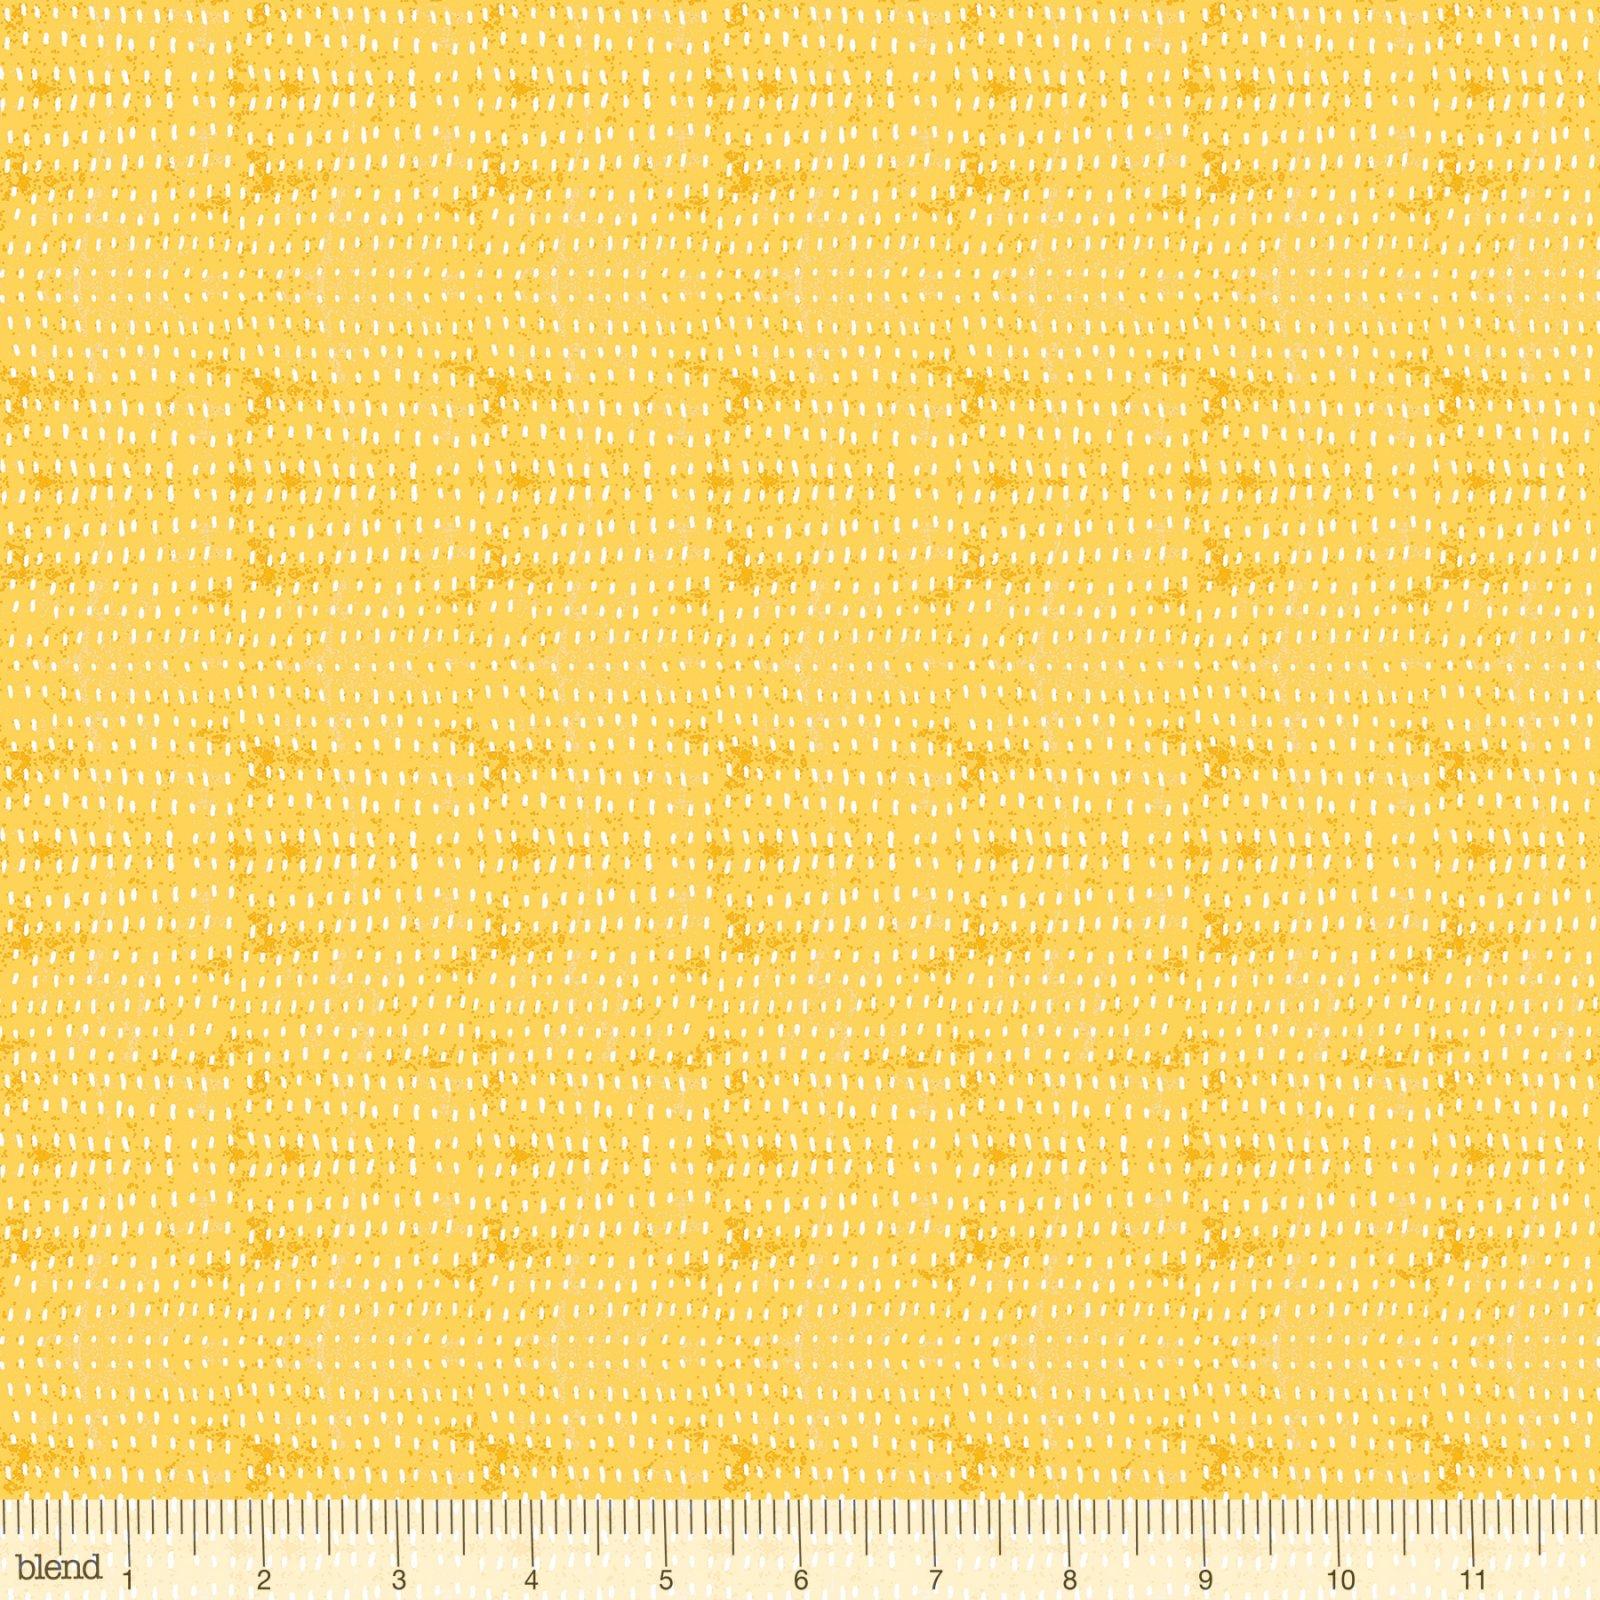 112.114.05 Butter Seeds Cori Dantini Blend Fabrics